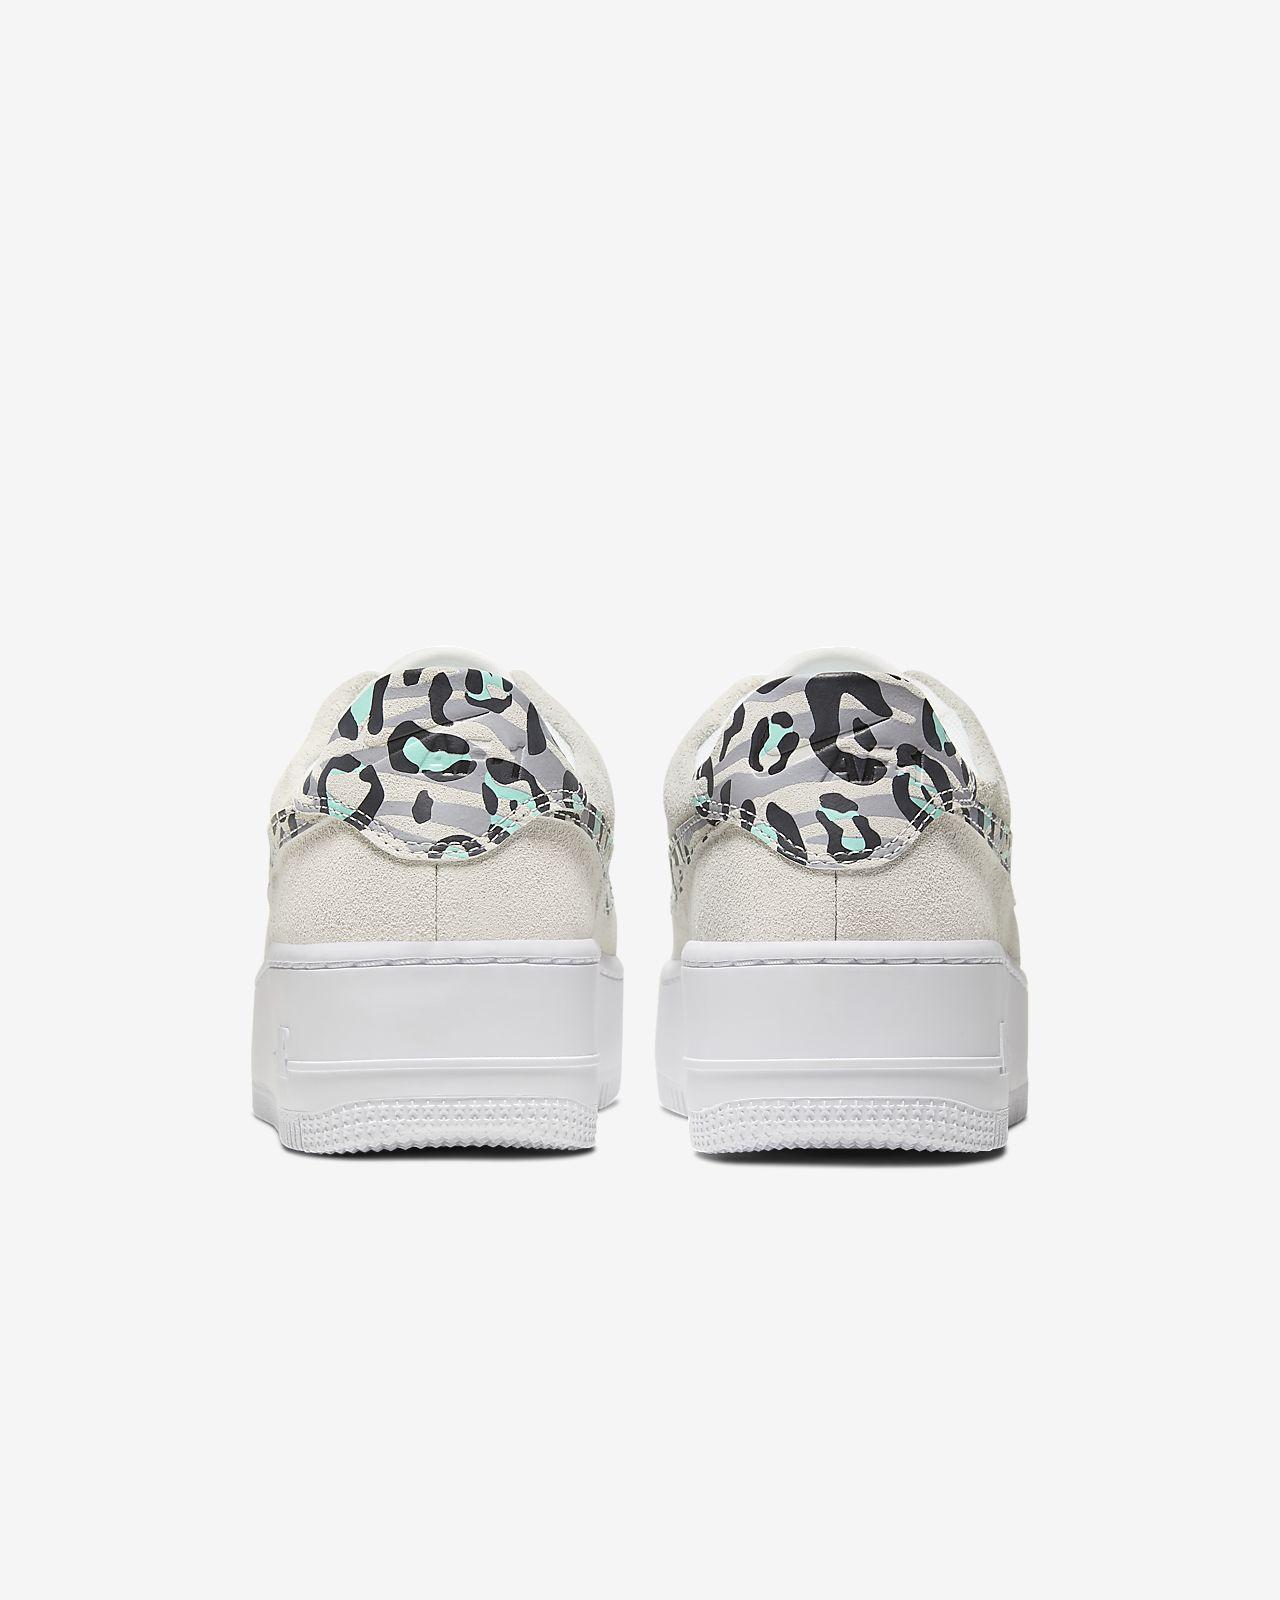 Nike Air VaporMax Flyknit 2 Cheetah Online Rendelés Férfi